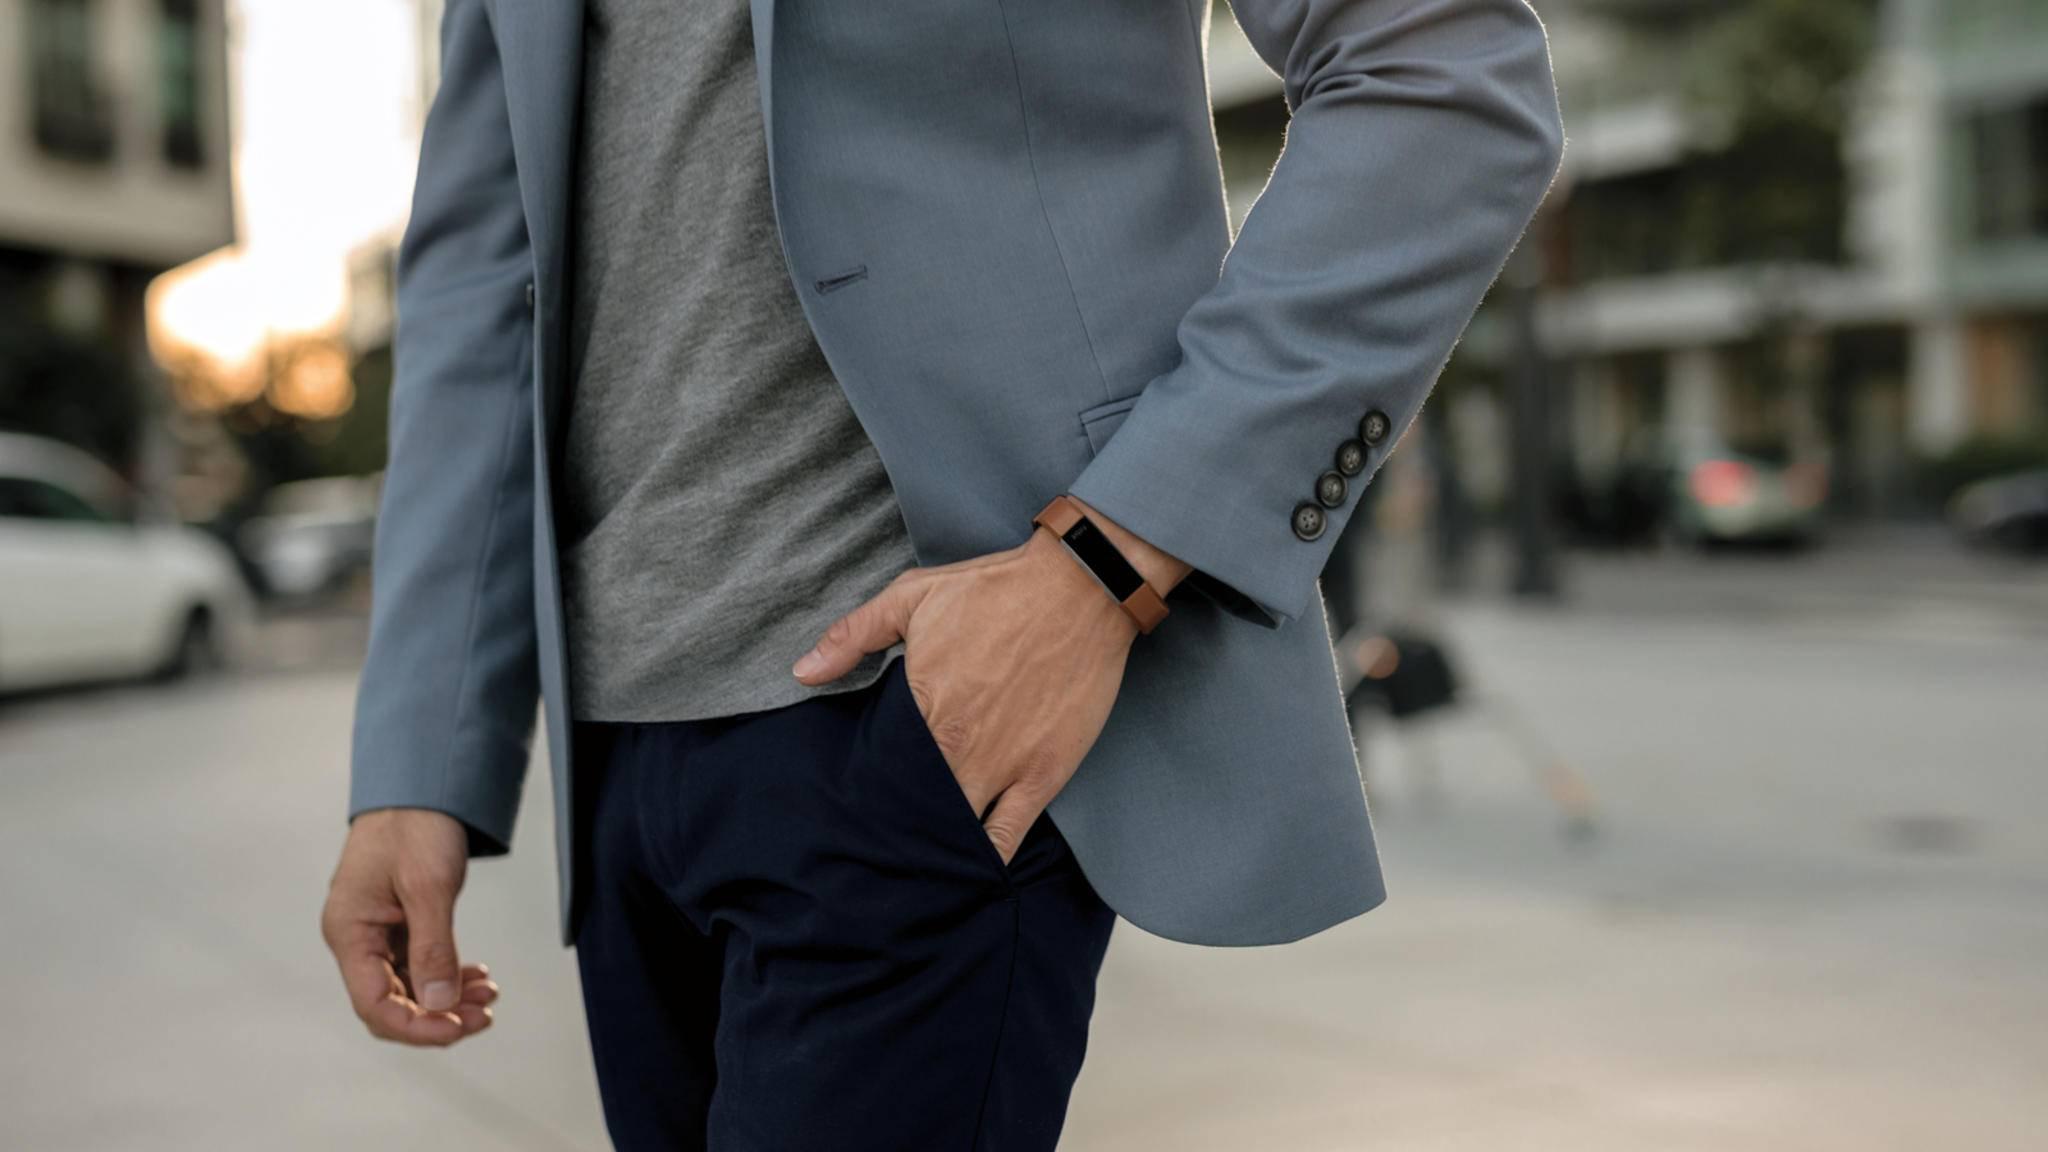 Wearables: Apple Watch dominiert den Markt